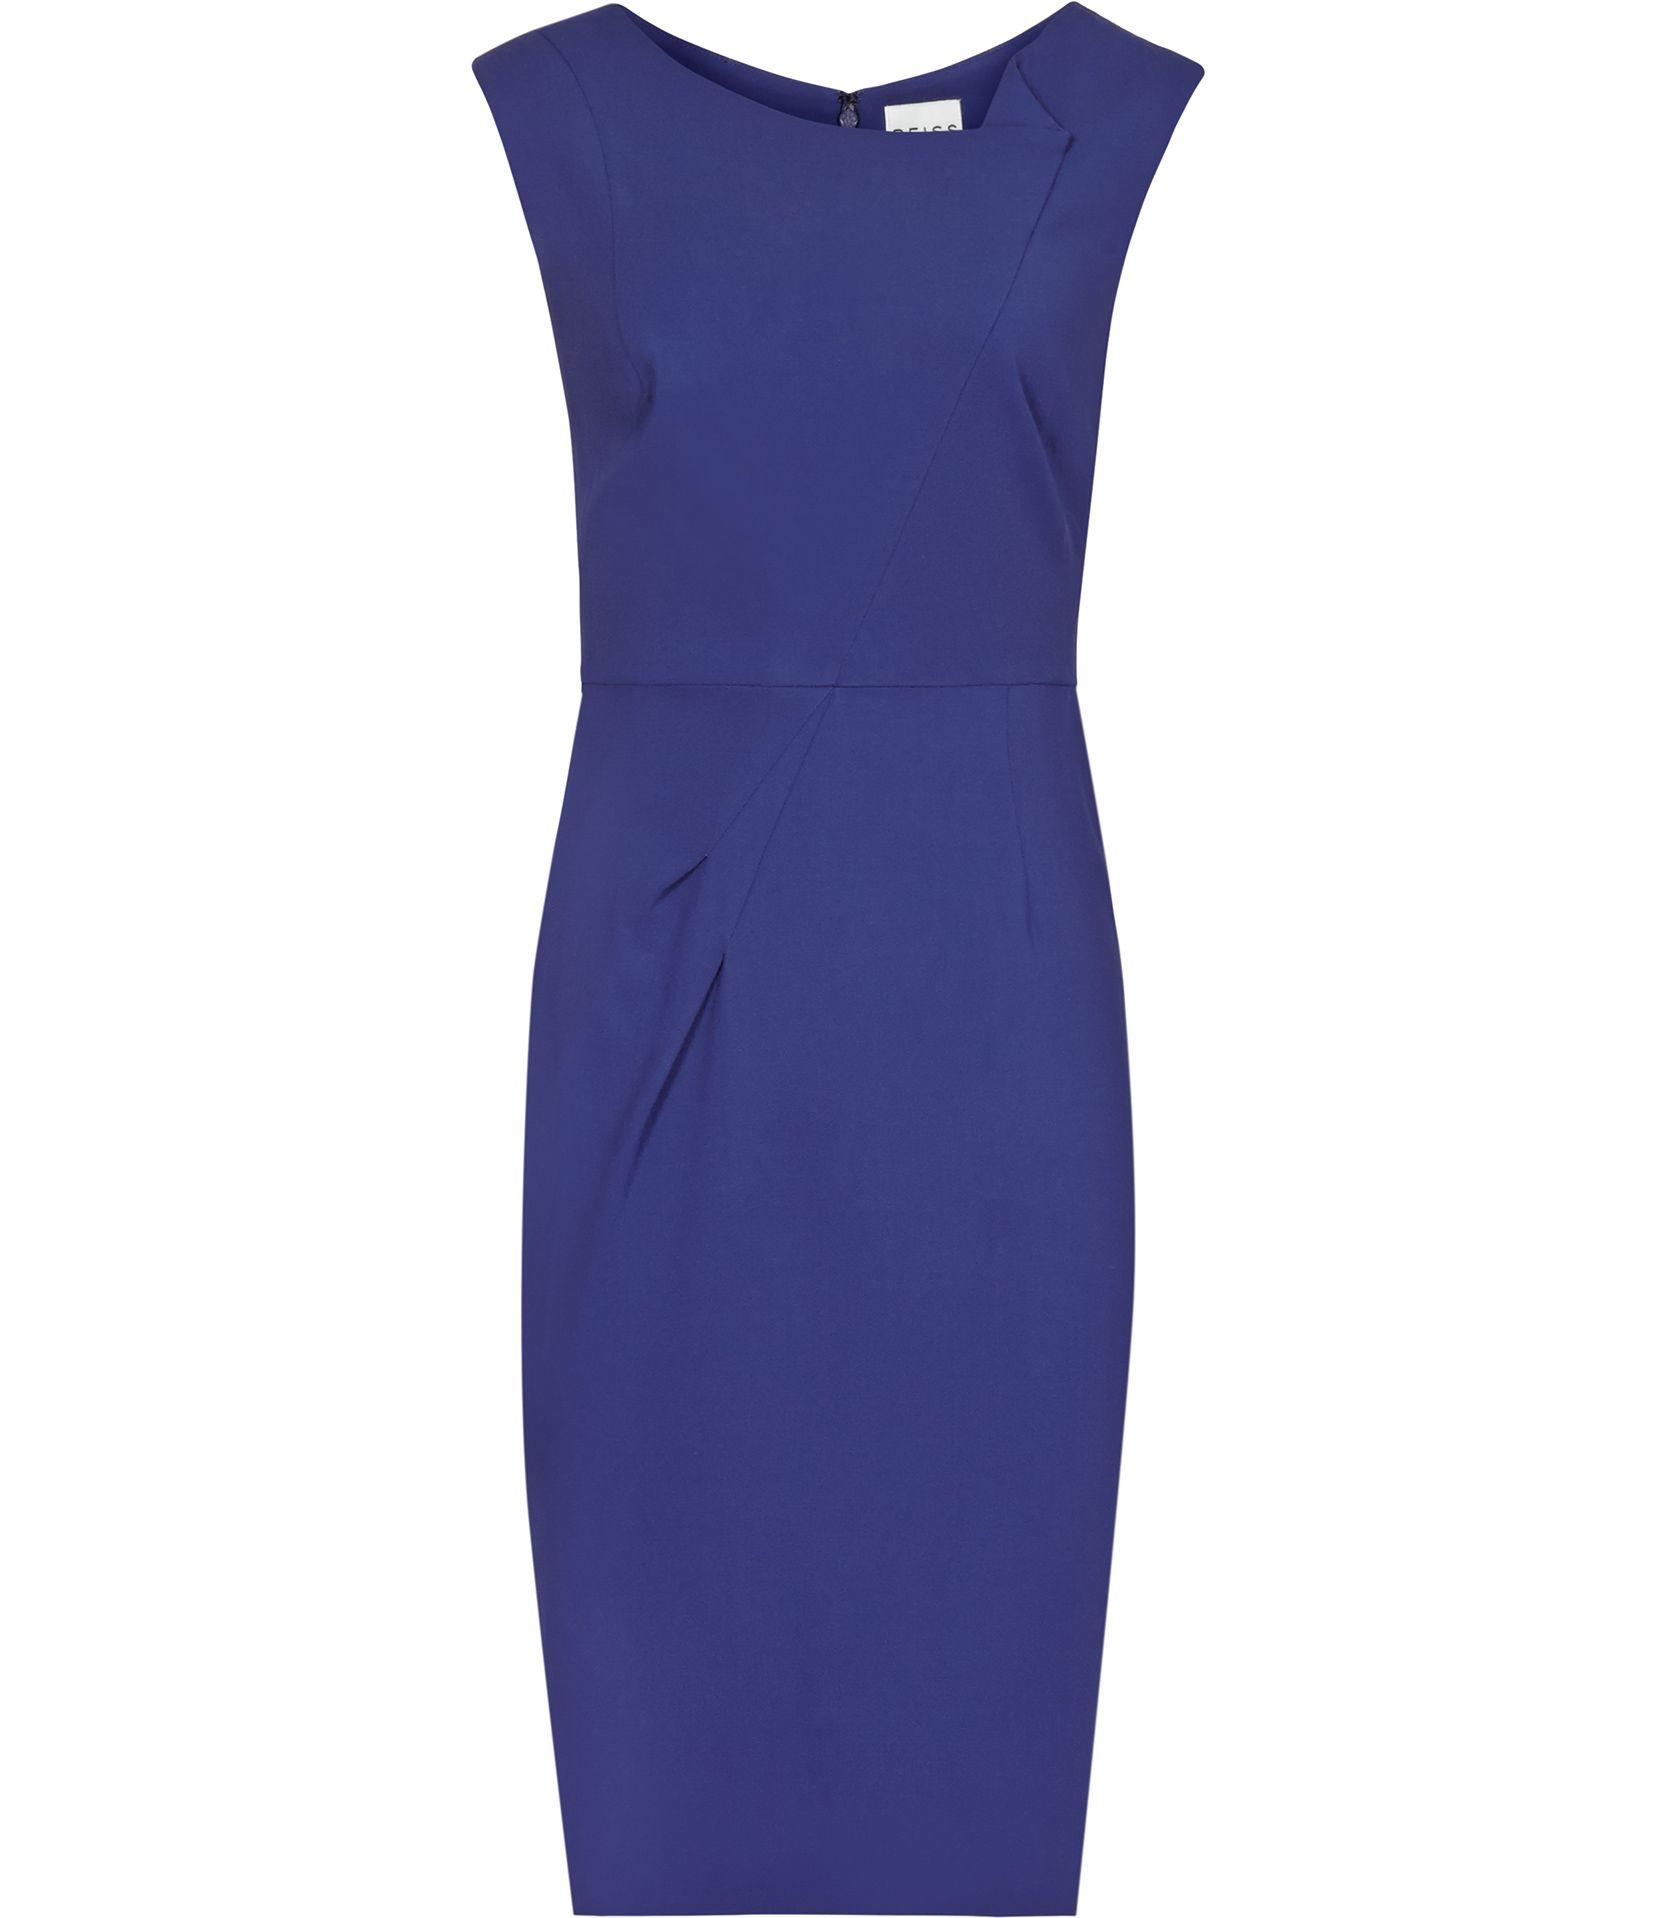 Womens Abyssal Blue Pleat-detail Dress - Reiss Giulia   NGUYEN THI 2 ...